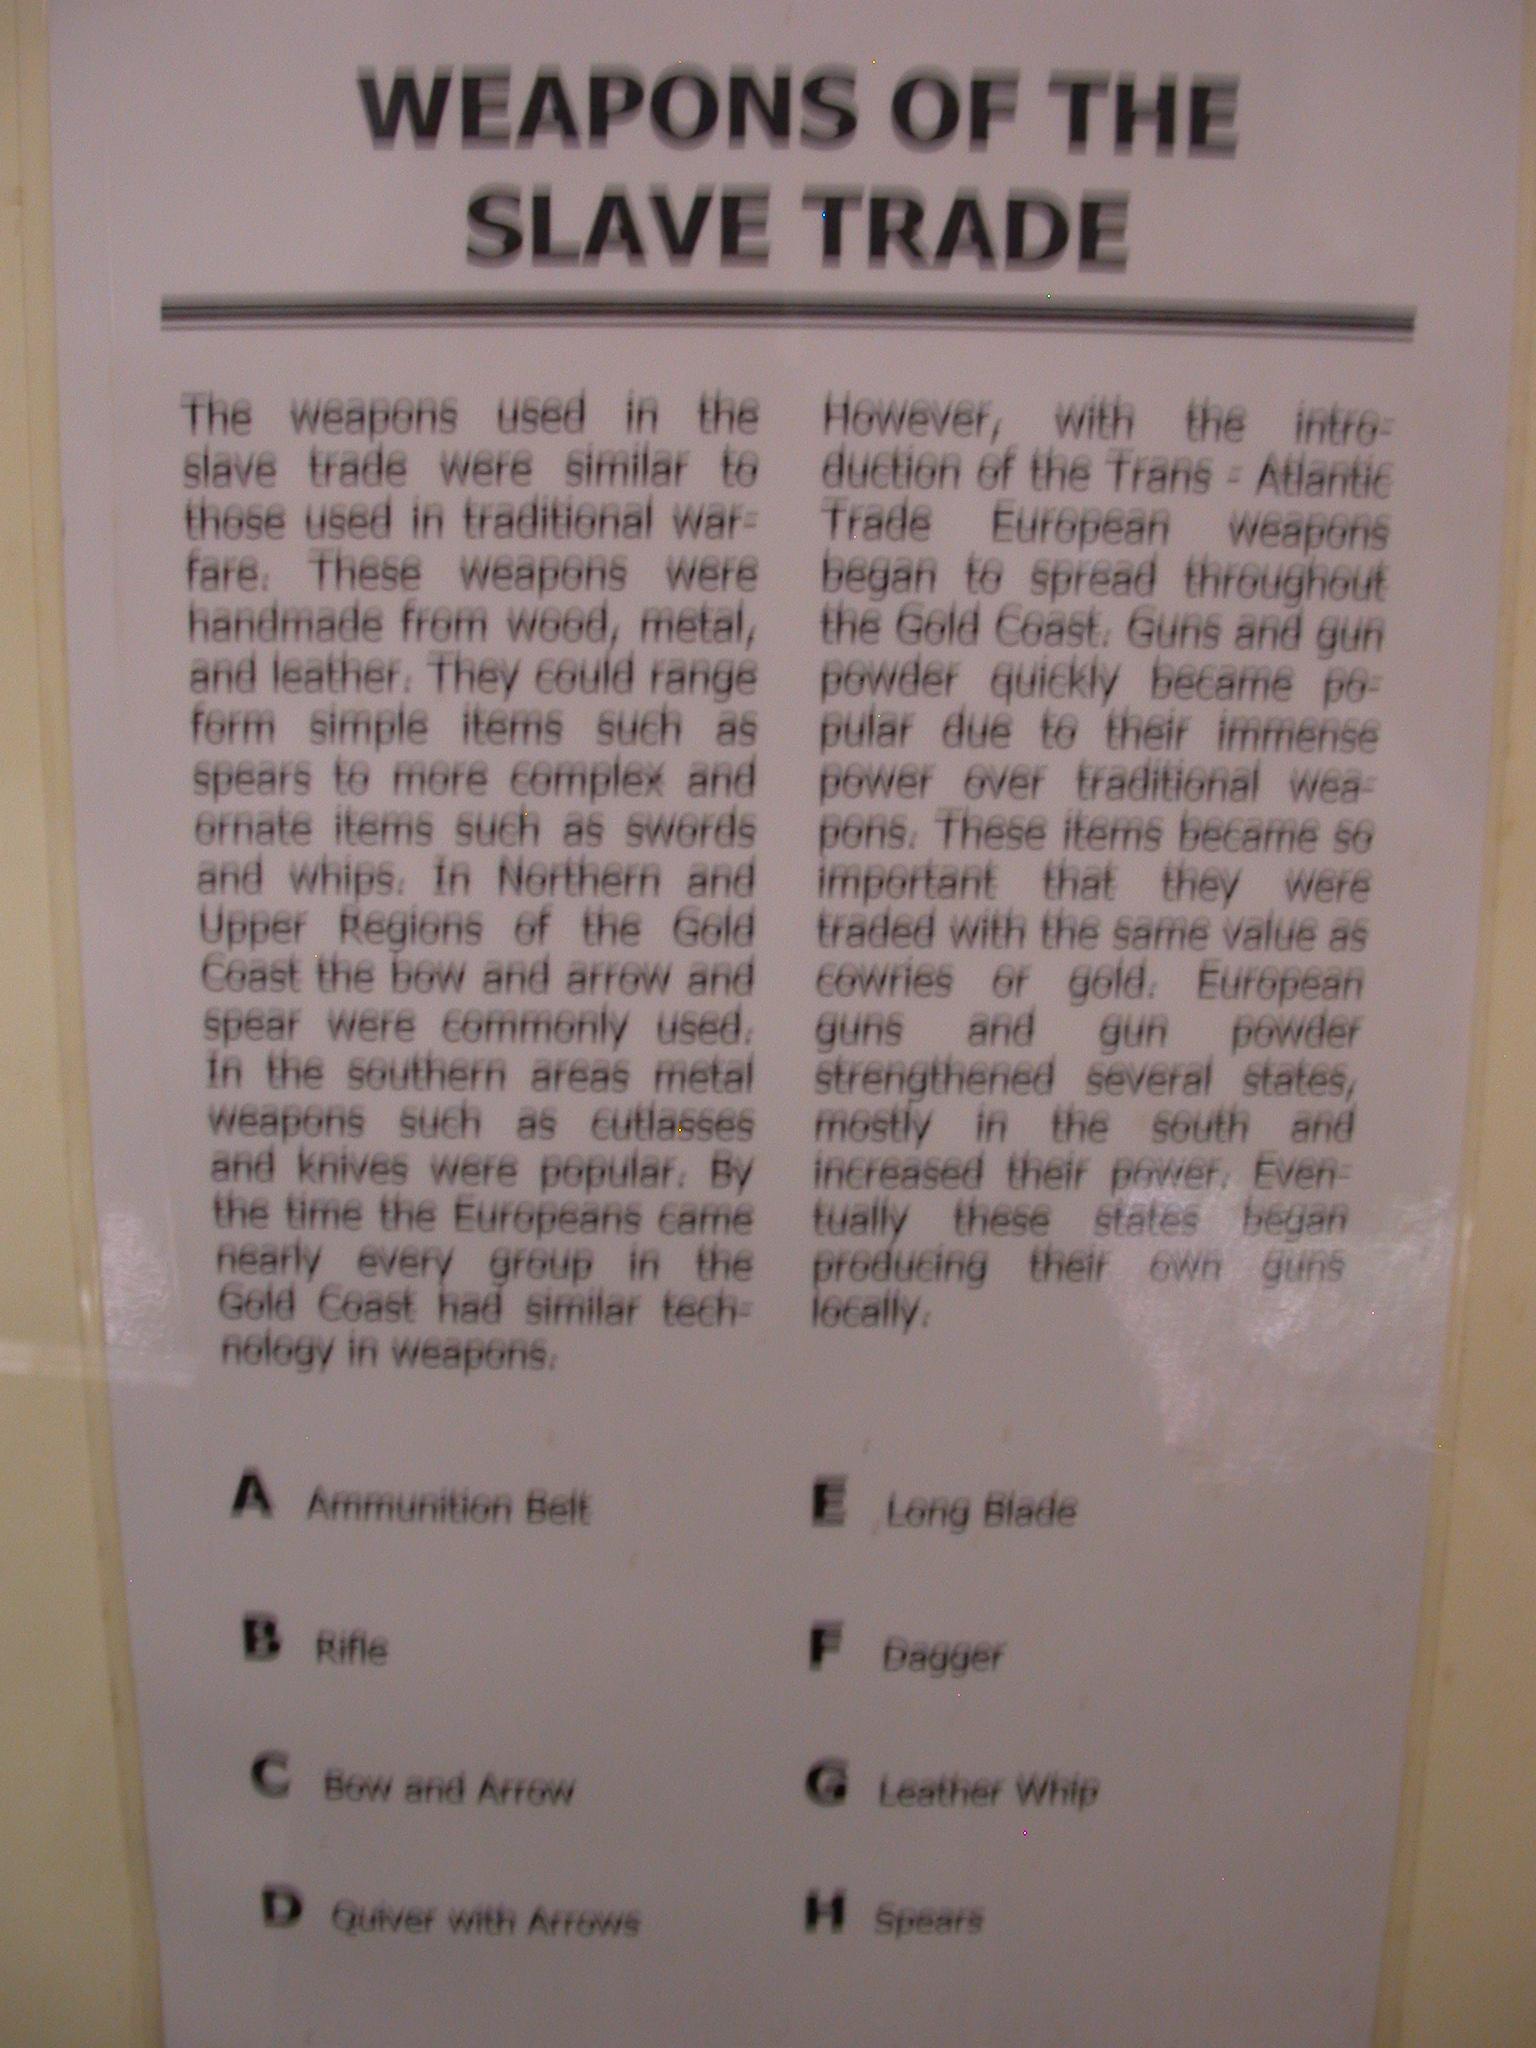 Slave Trade Weapons Description, National Museum, Accra, Ghana